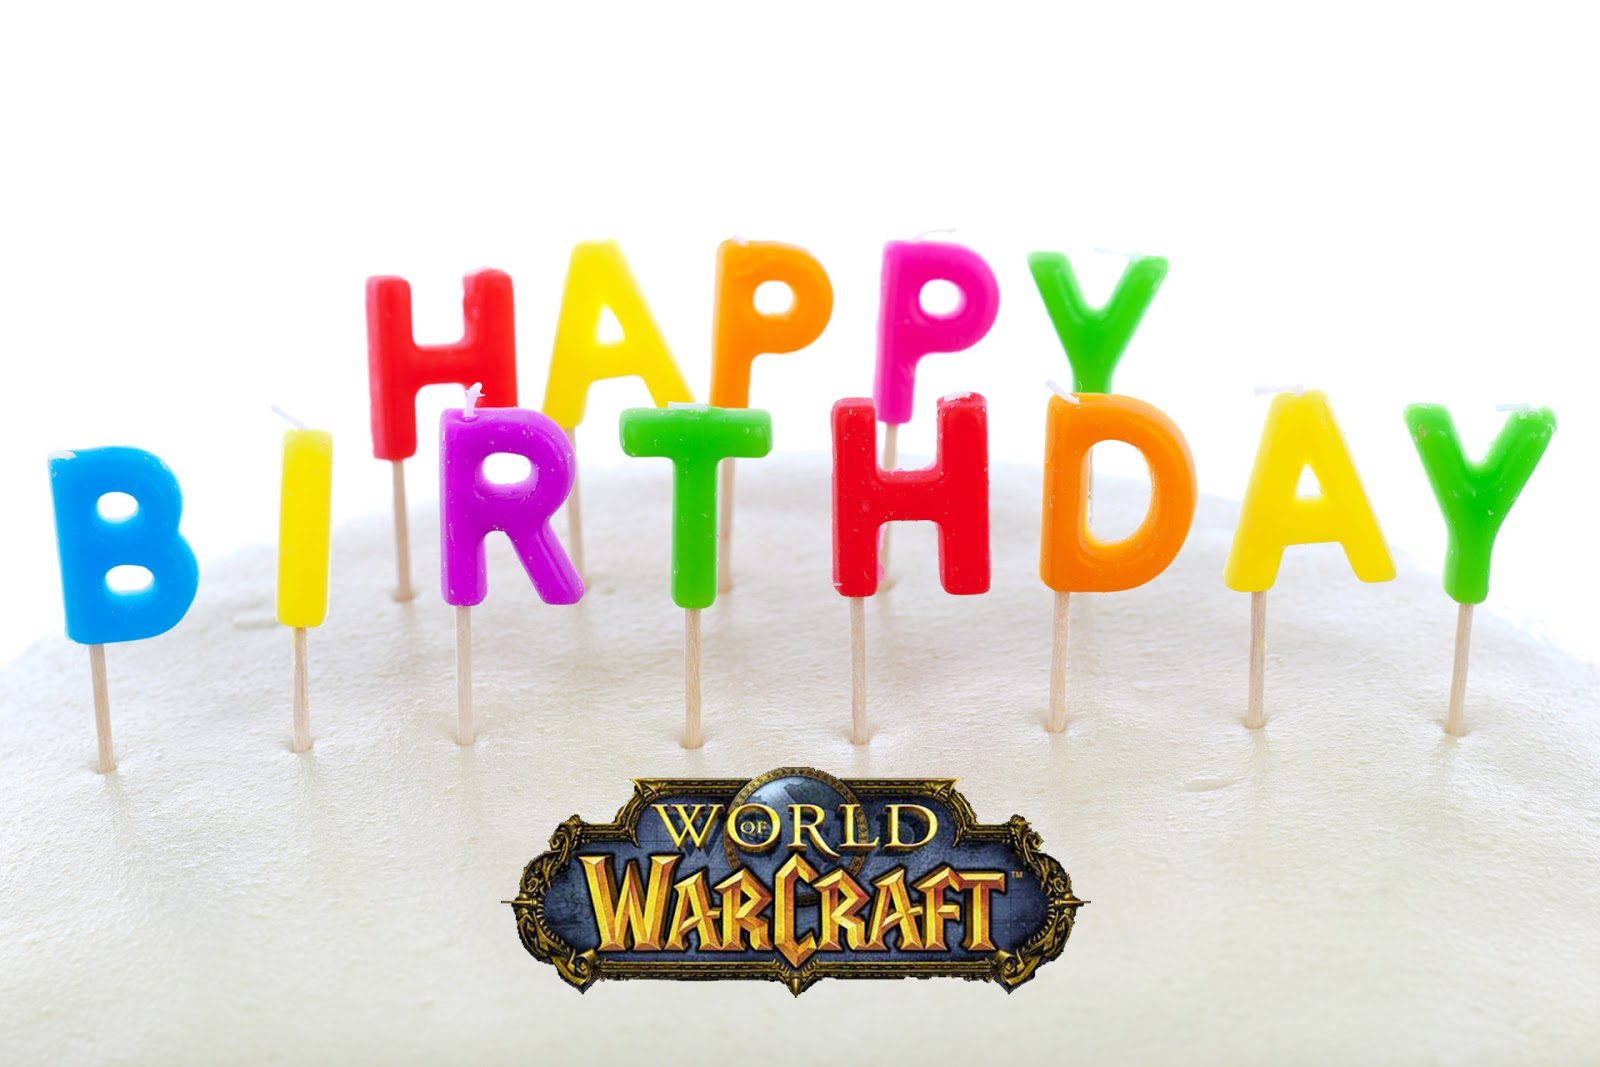 http://3.bp.blogspot.com/-1dS8qU4LNfs/UKuauYJNGEI/AAAAAAAACqk/Om7ygzE4ORQ/s1600/happy-birthday.jpg